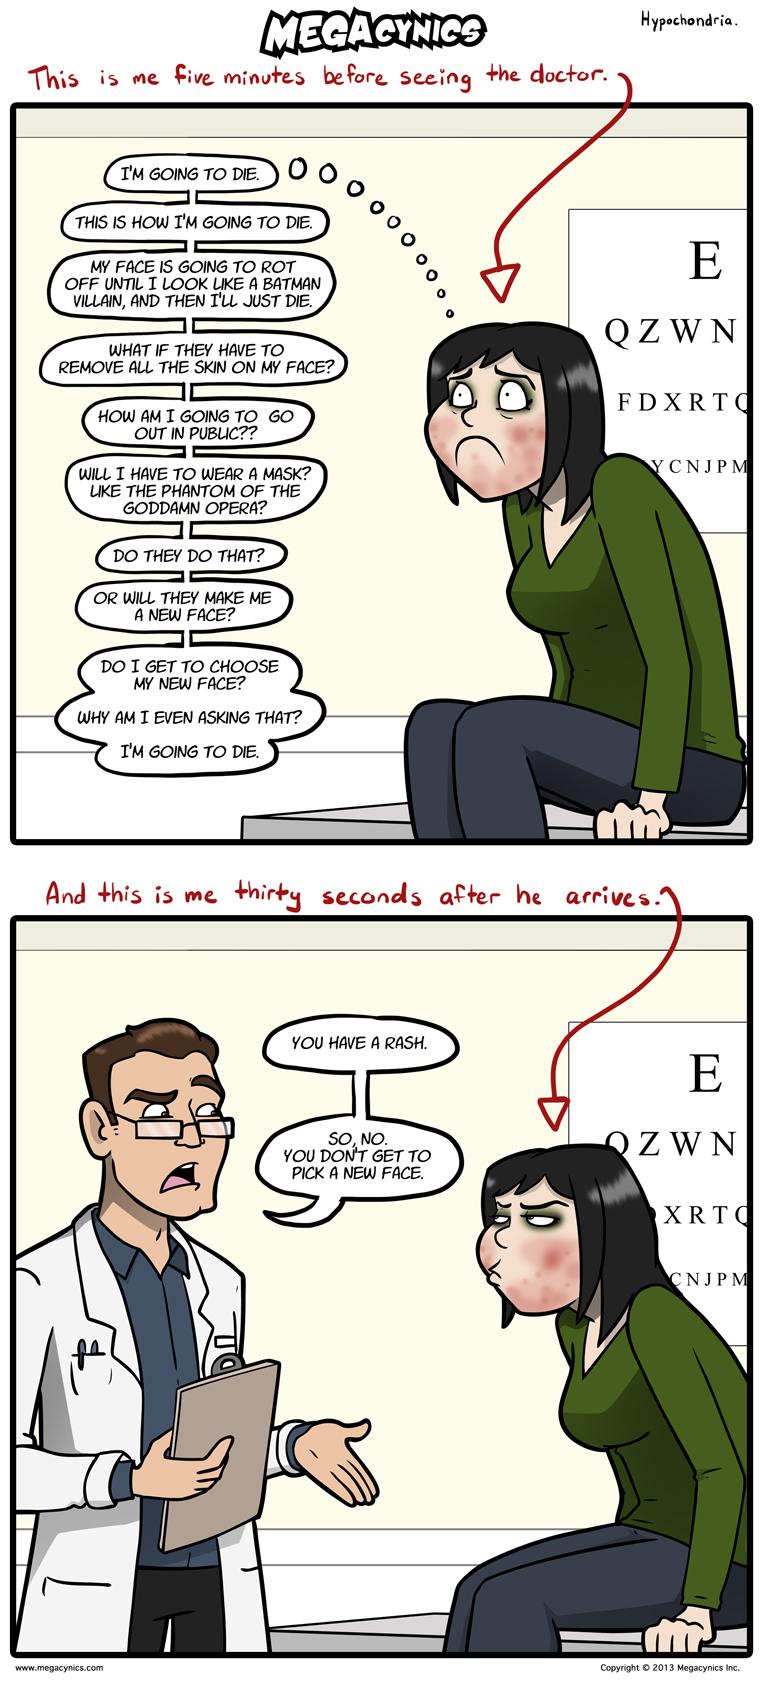 MegaCynics: Hypochondria (Oct 2, 2013)